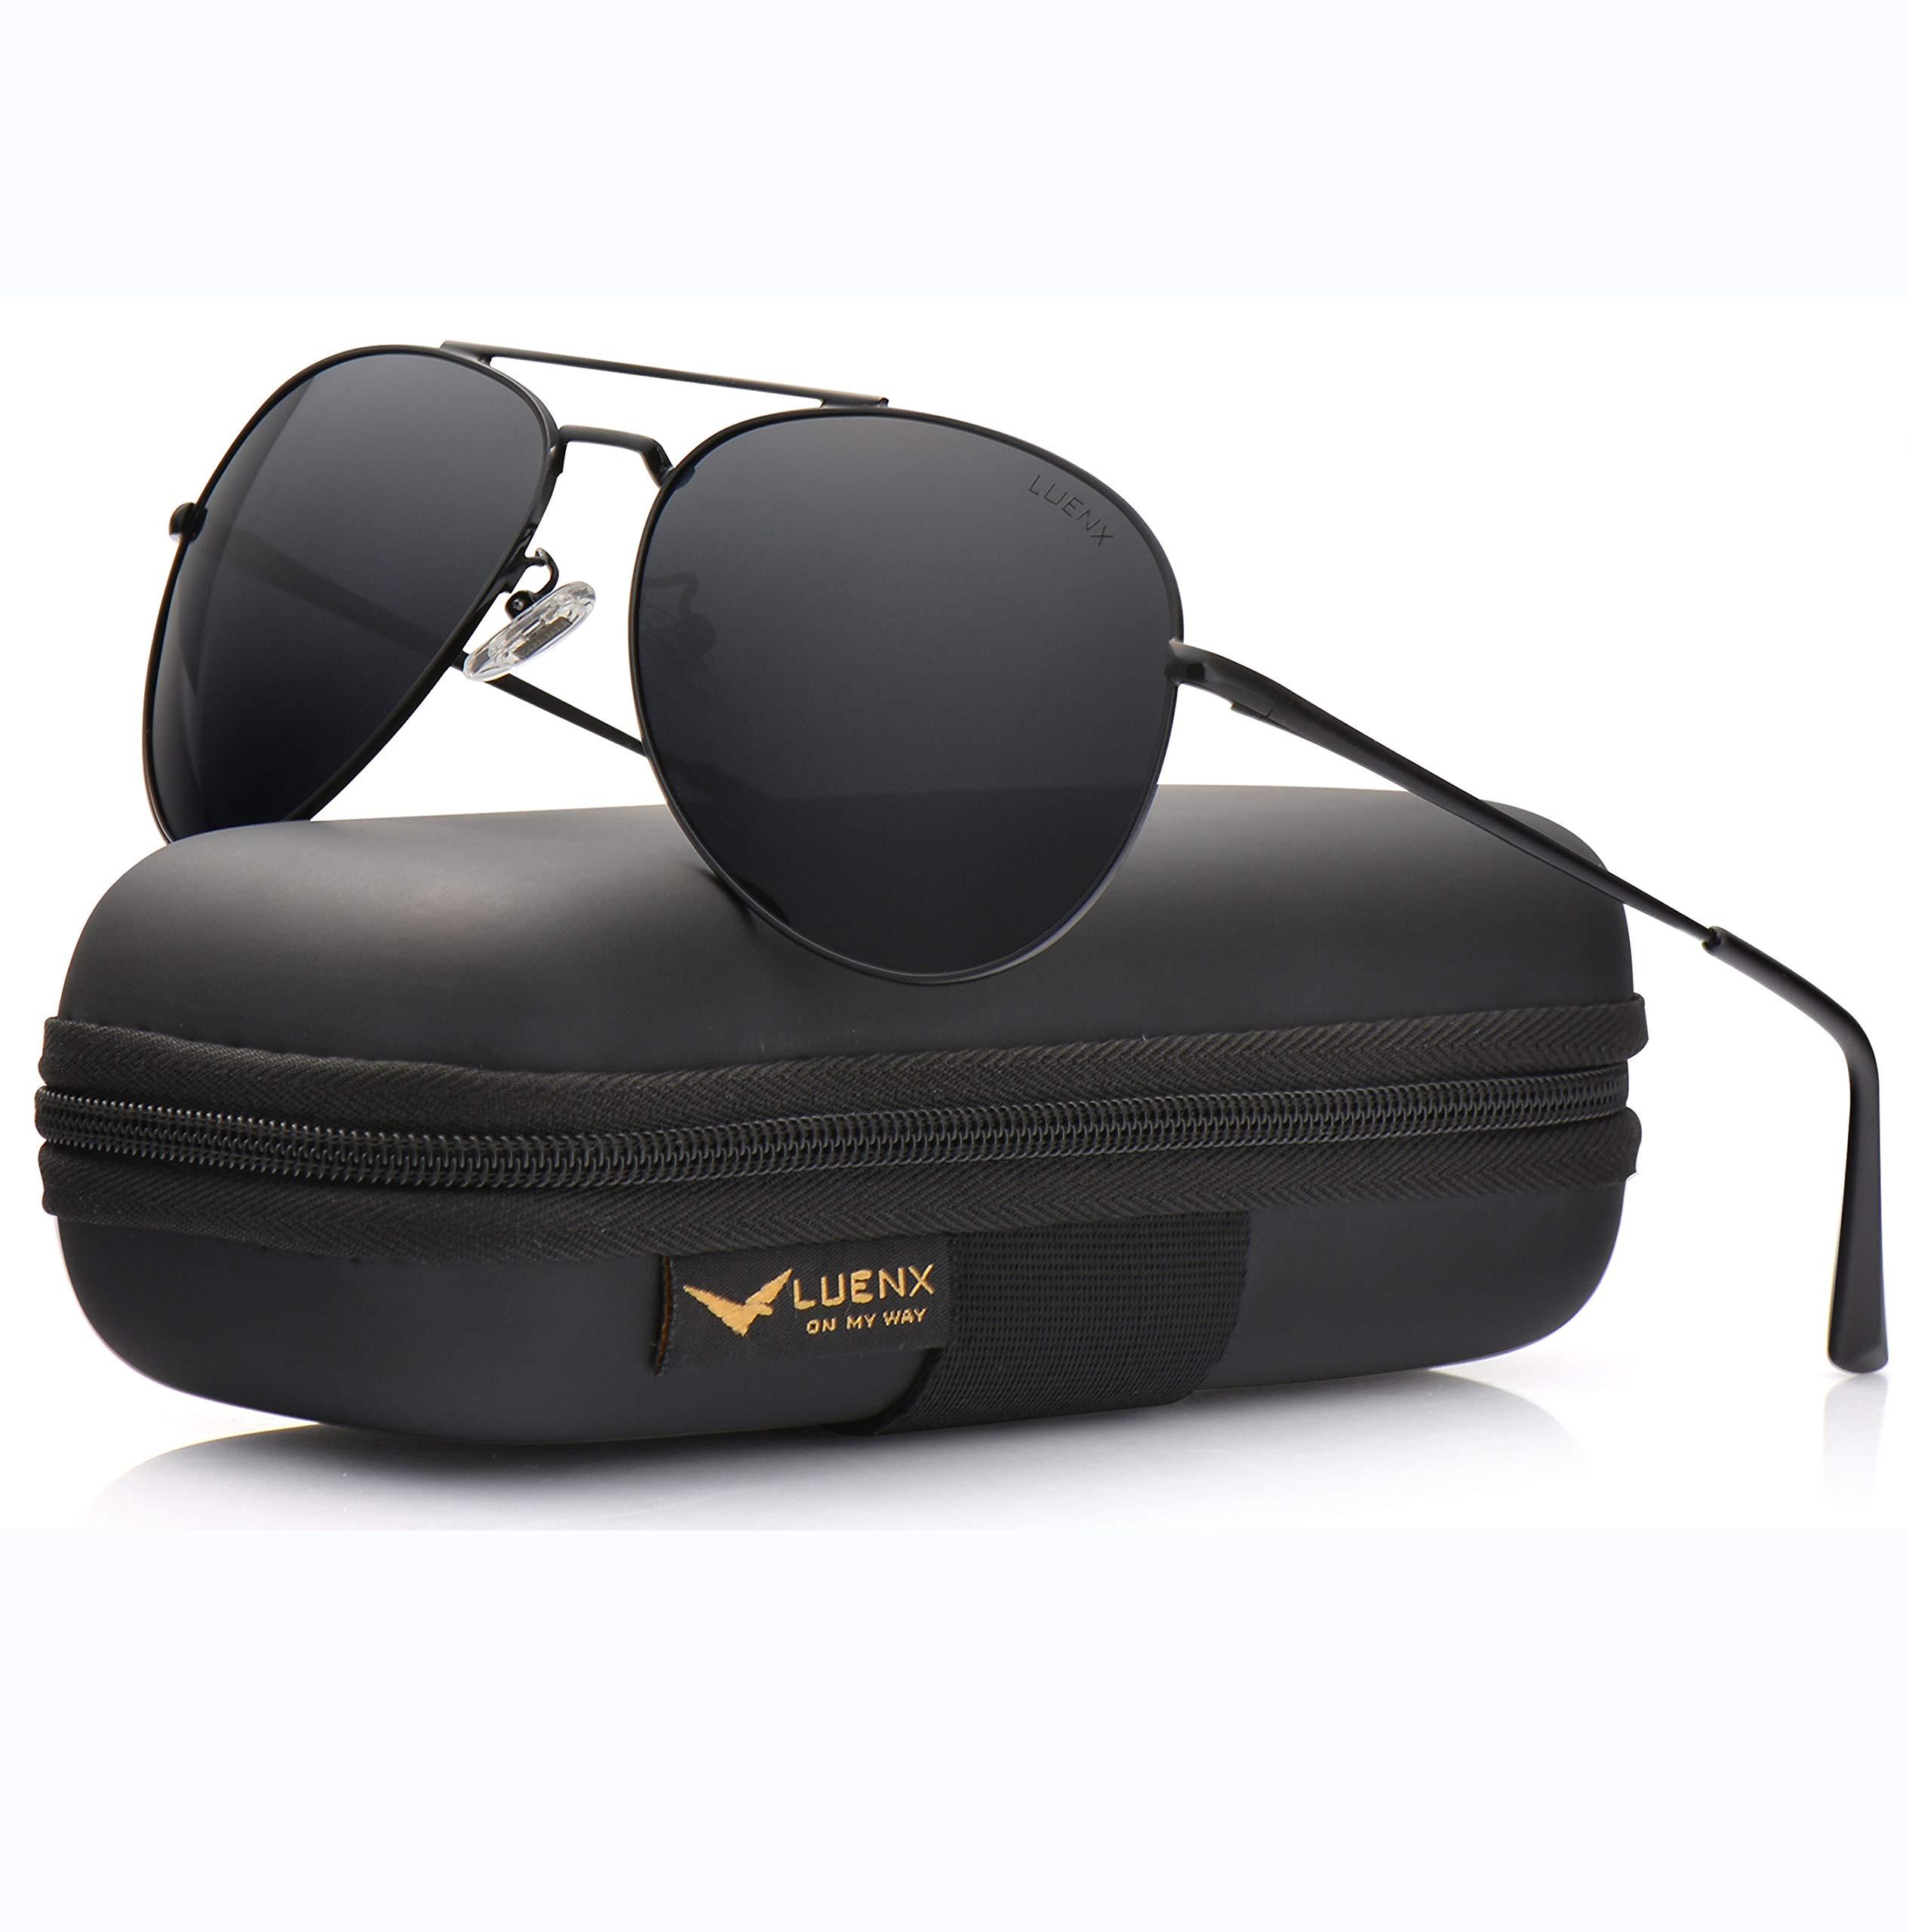 bc22ef5996 Galleon - LUENX Aviator Sunglasses Men Women Polarized With Case - UV 400  Non-Mirror Black Lens Metal Black Frame 60mm